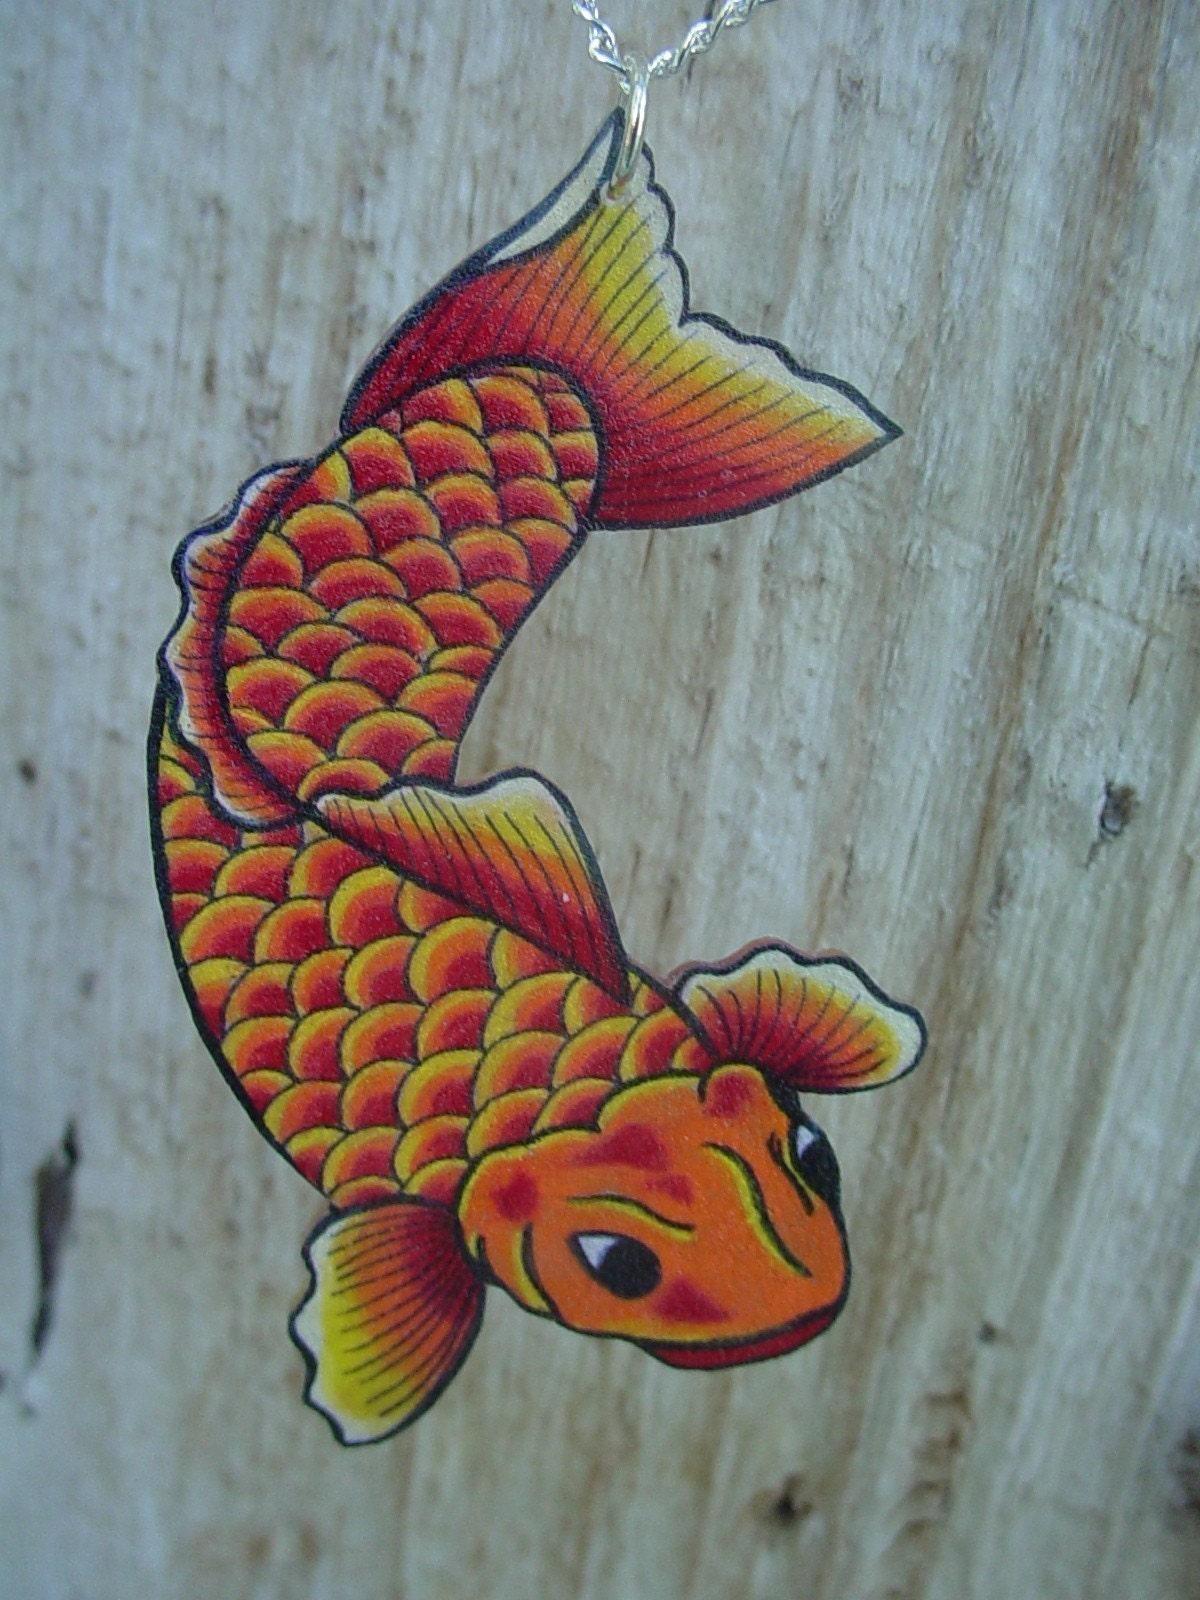 michael scofield tattoo design